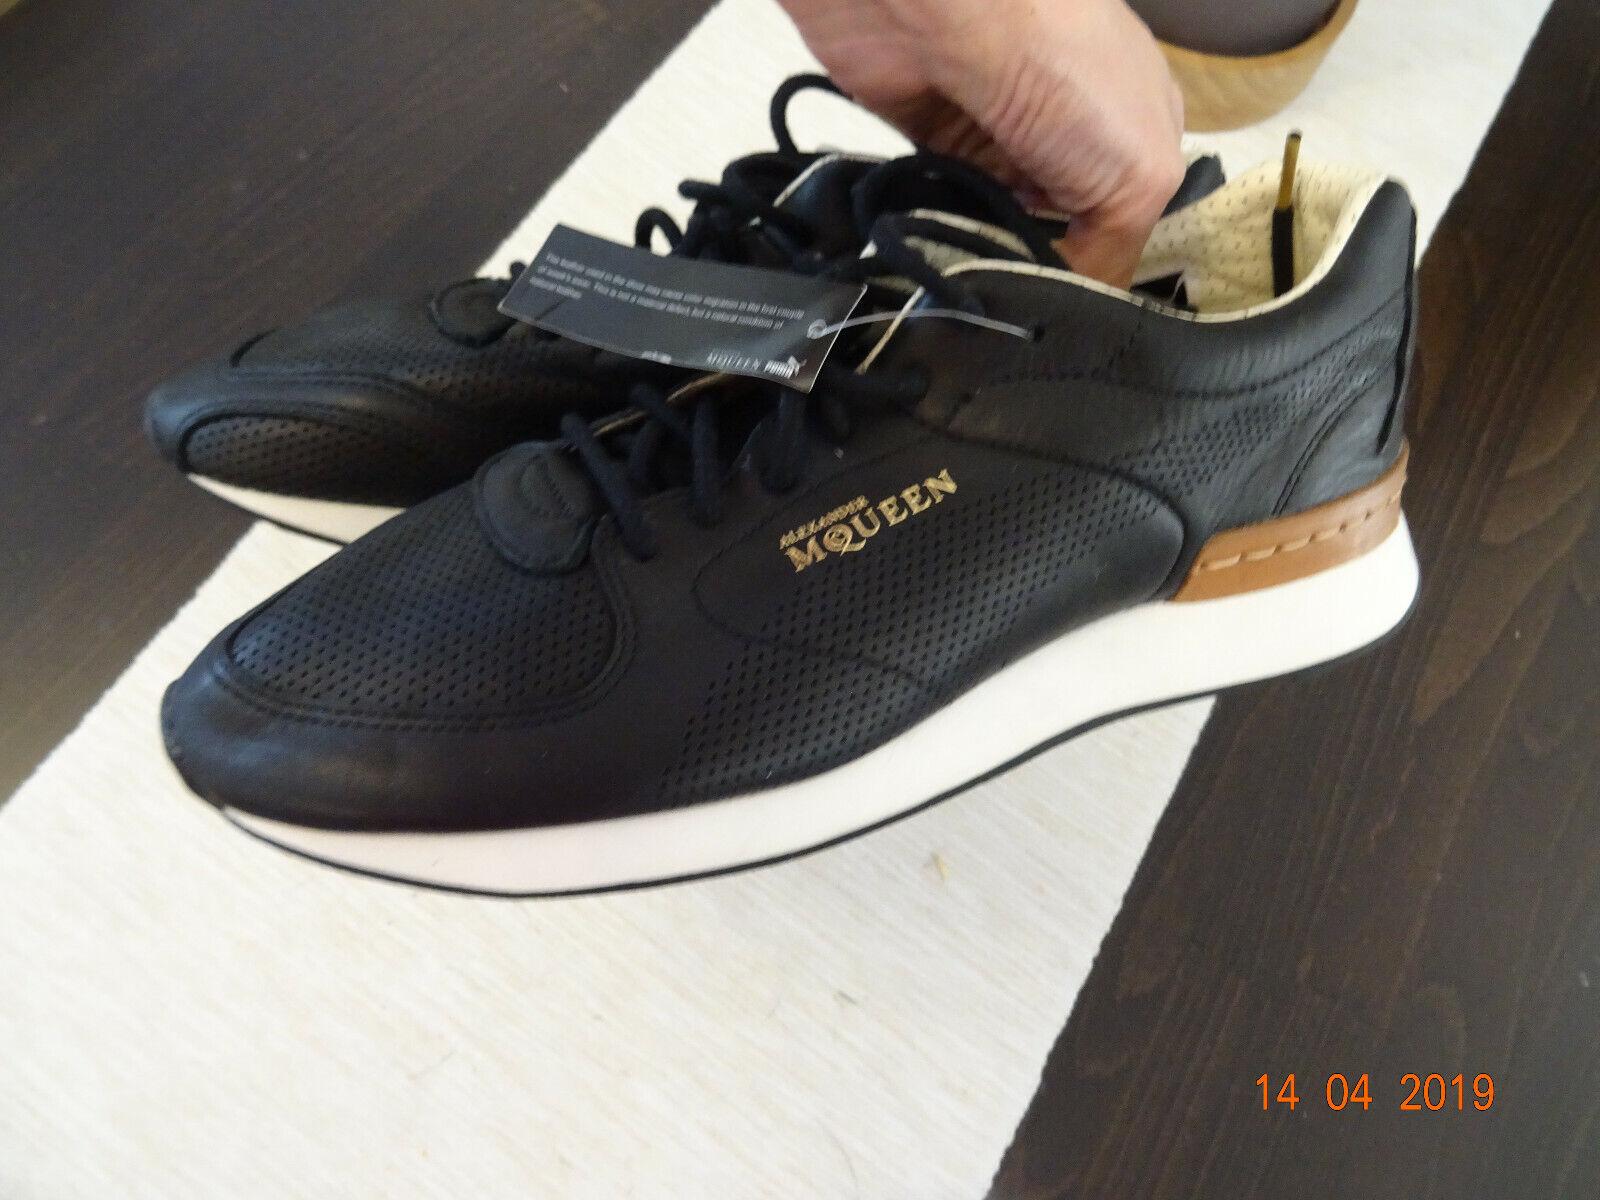 Puma Alexander Mqueen Designer Turnschuhe Sportschuhe schwarz Leder 42 UK8 US9  NEU